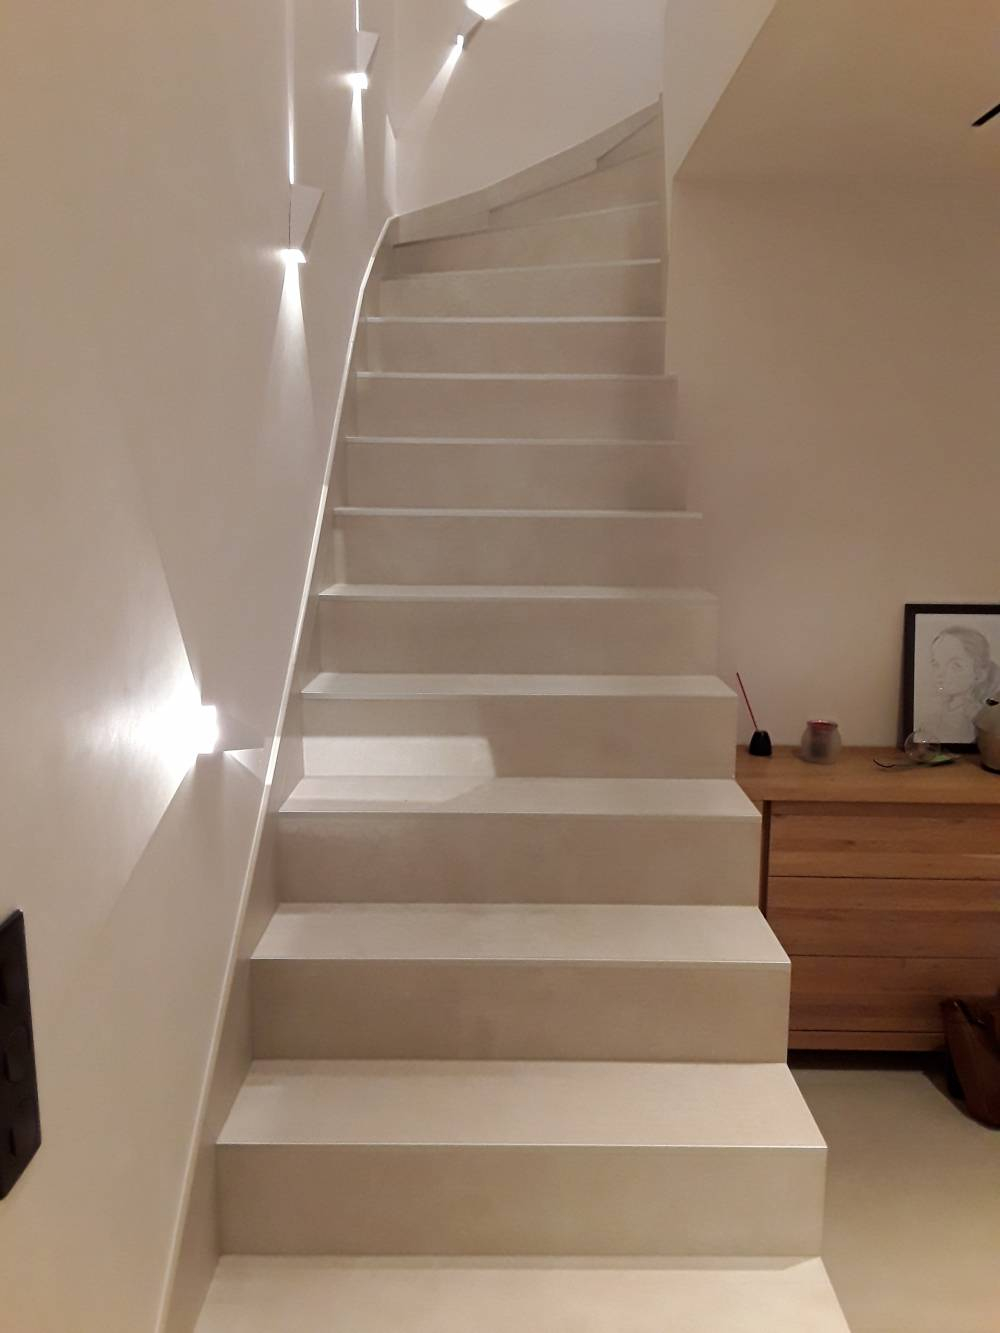 Grand Lieu Carrelage : Pose De De Carrelage Sur Un Escalier ... serapportantà Plinthe Carrelage Escalier